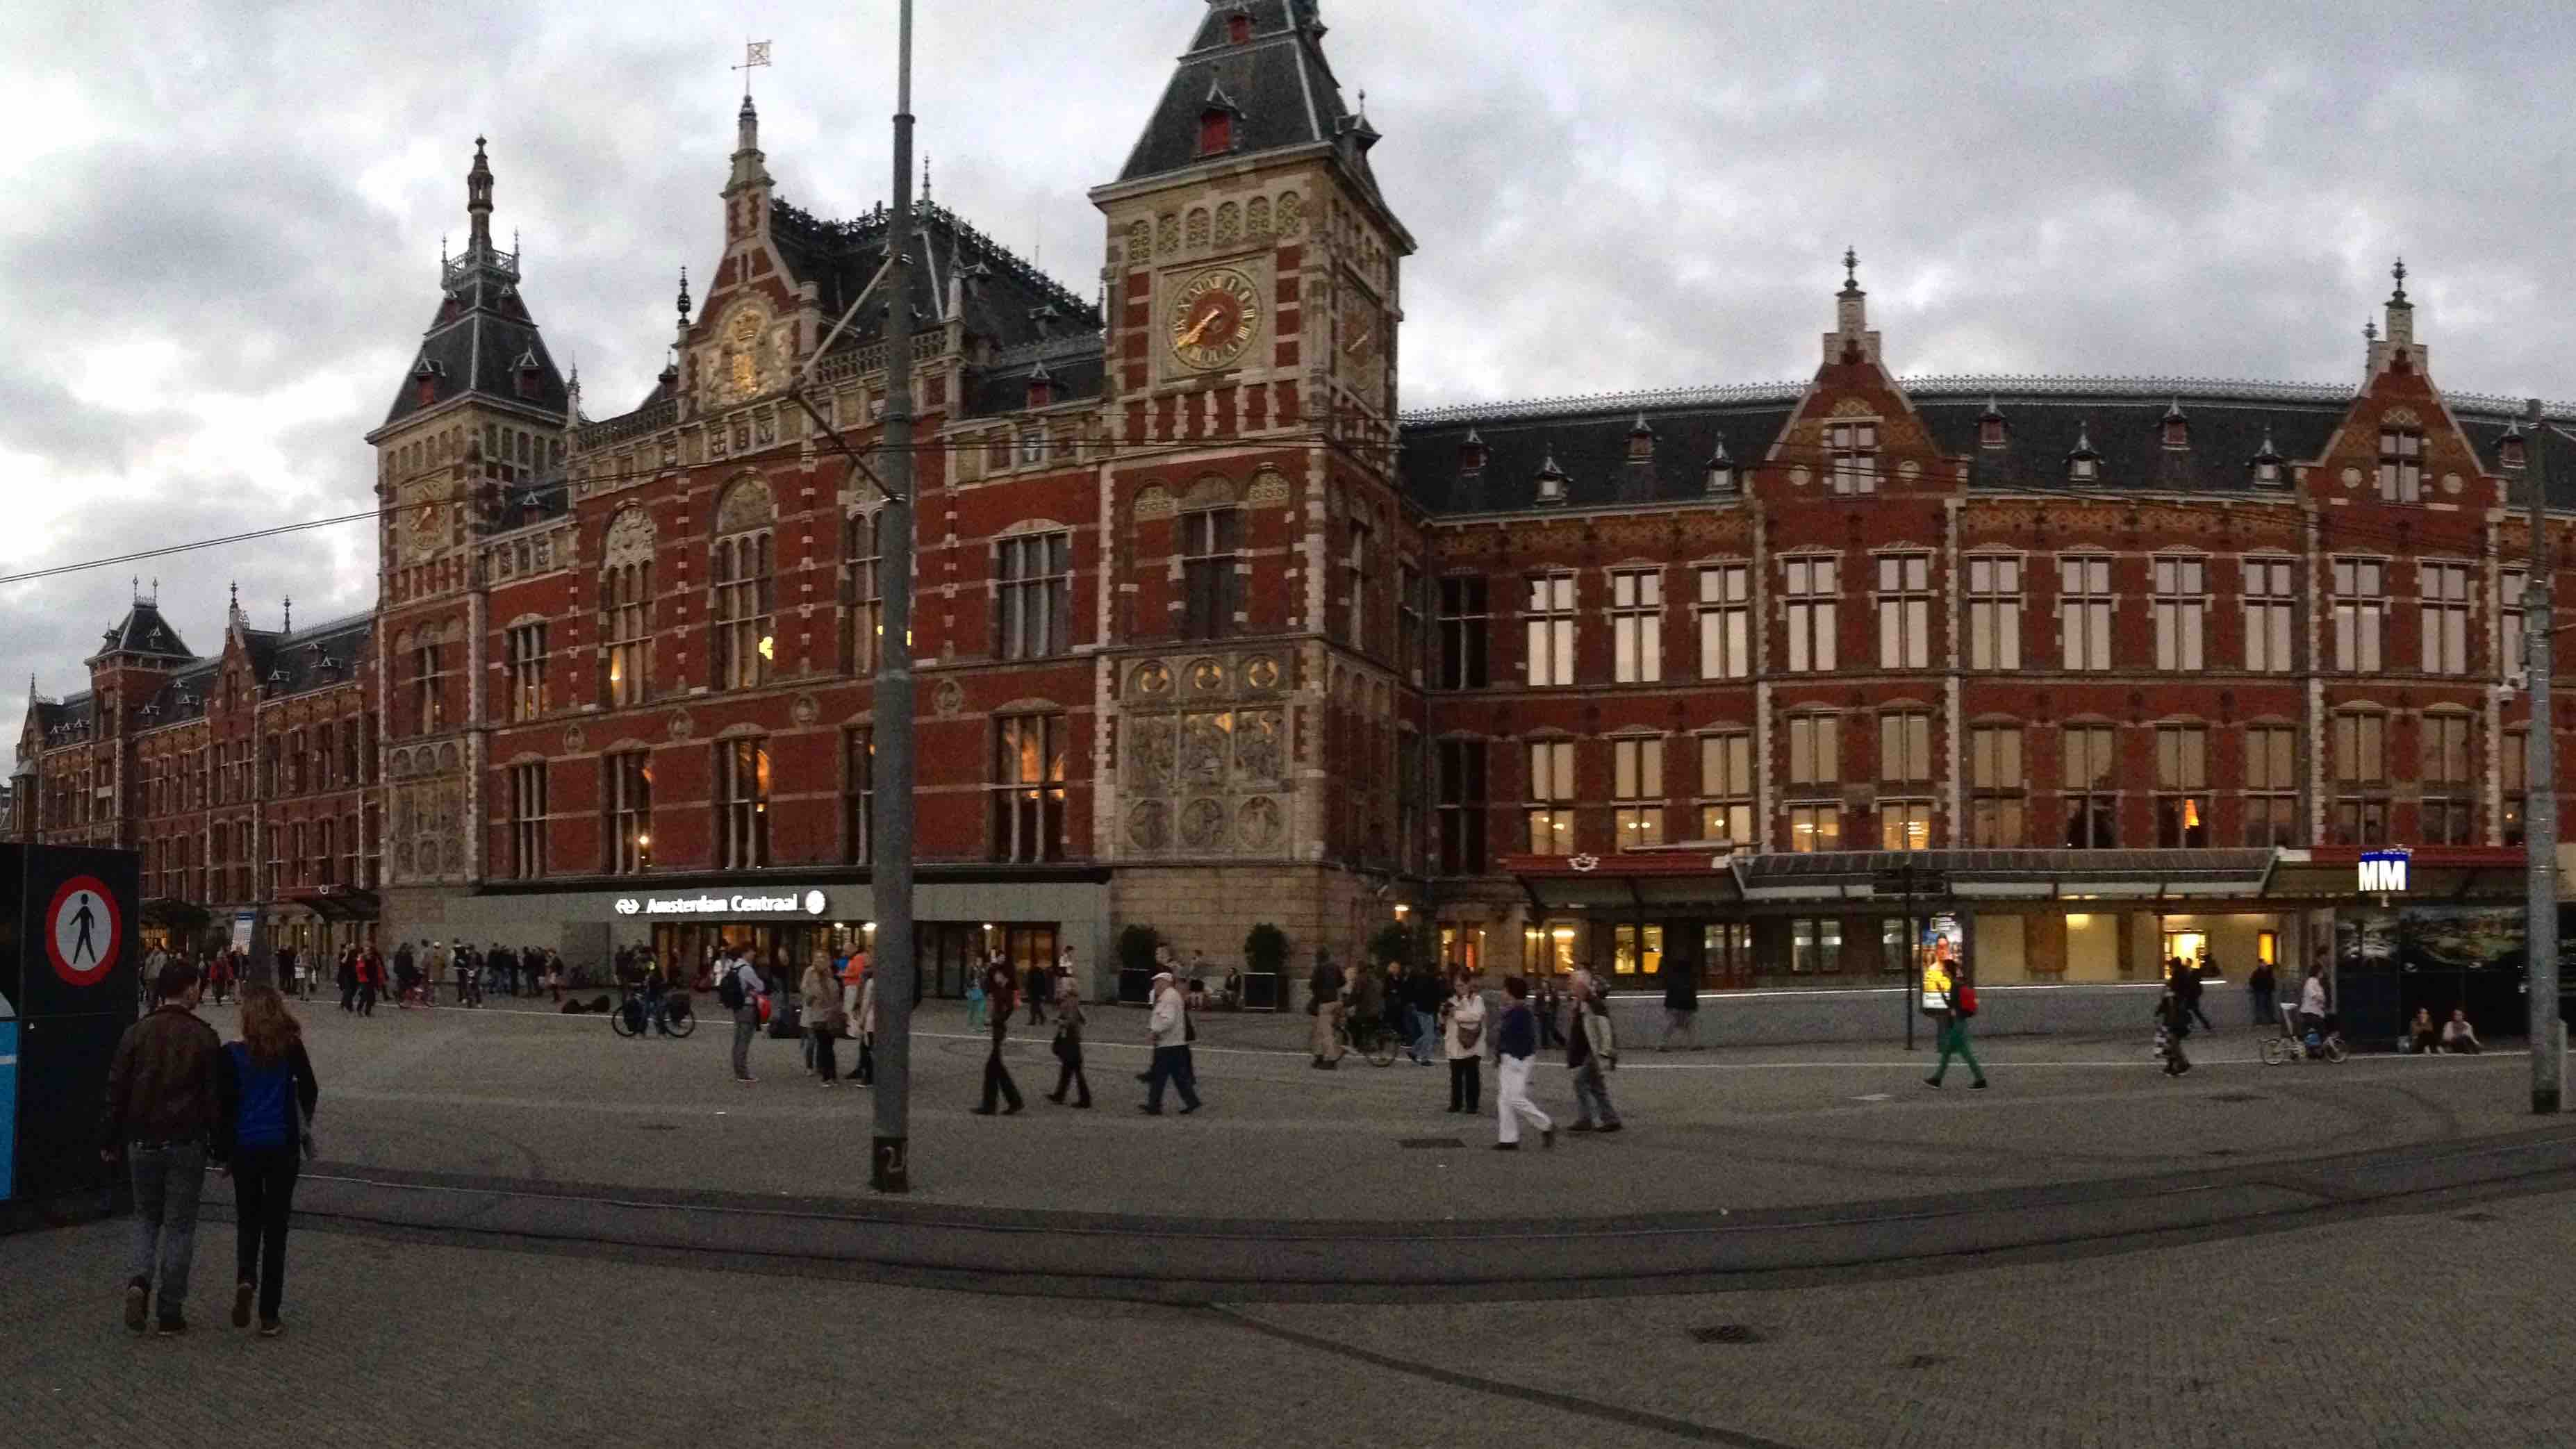 Trainstation, Amsterdam